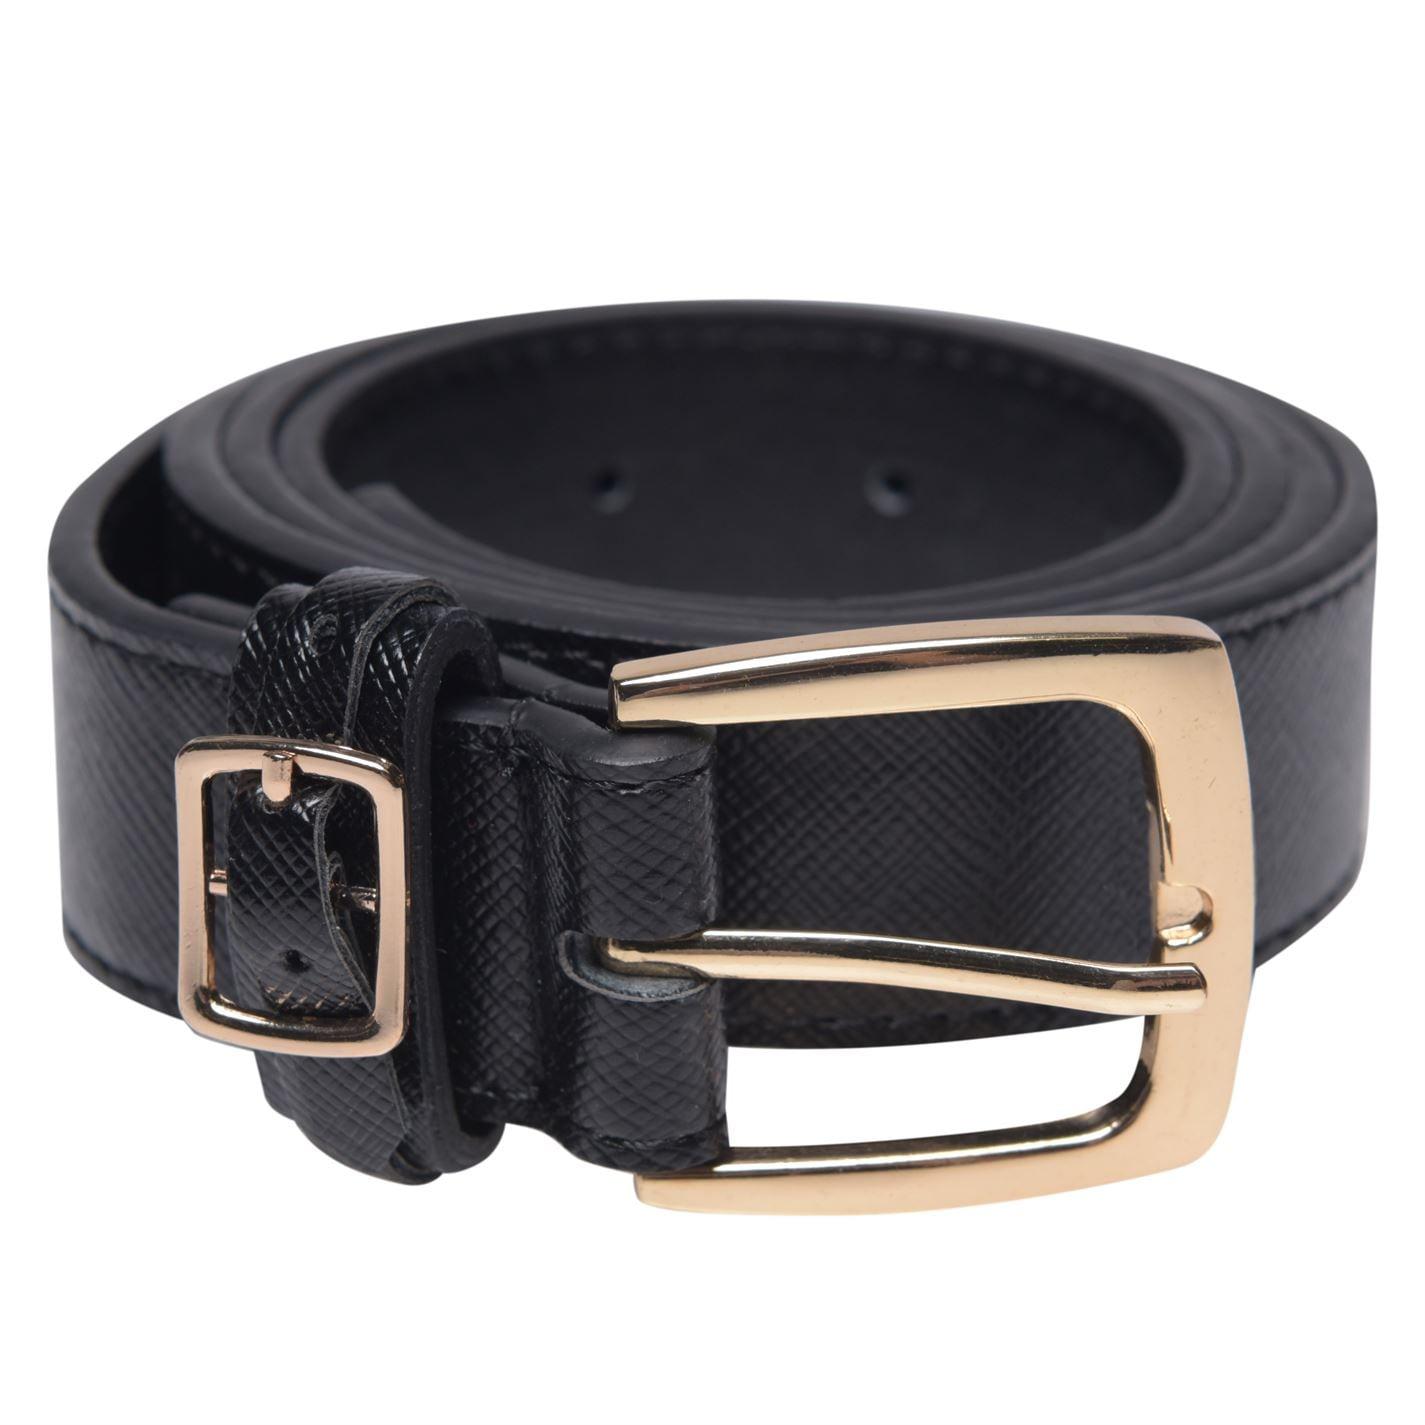 Kangol Double Buckle Belt Ladies